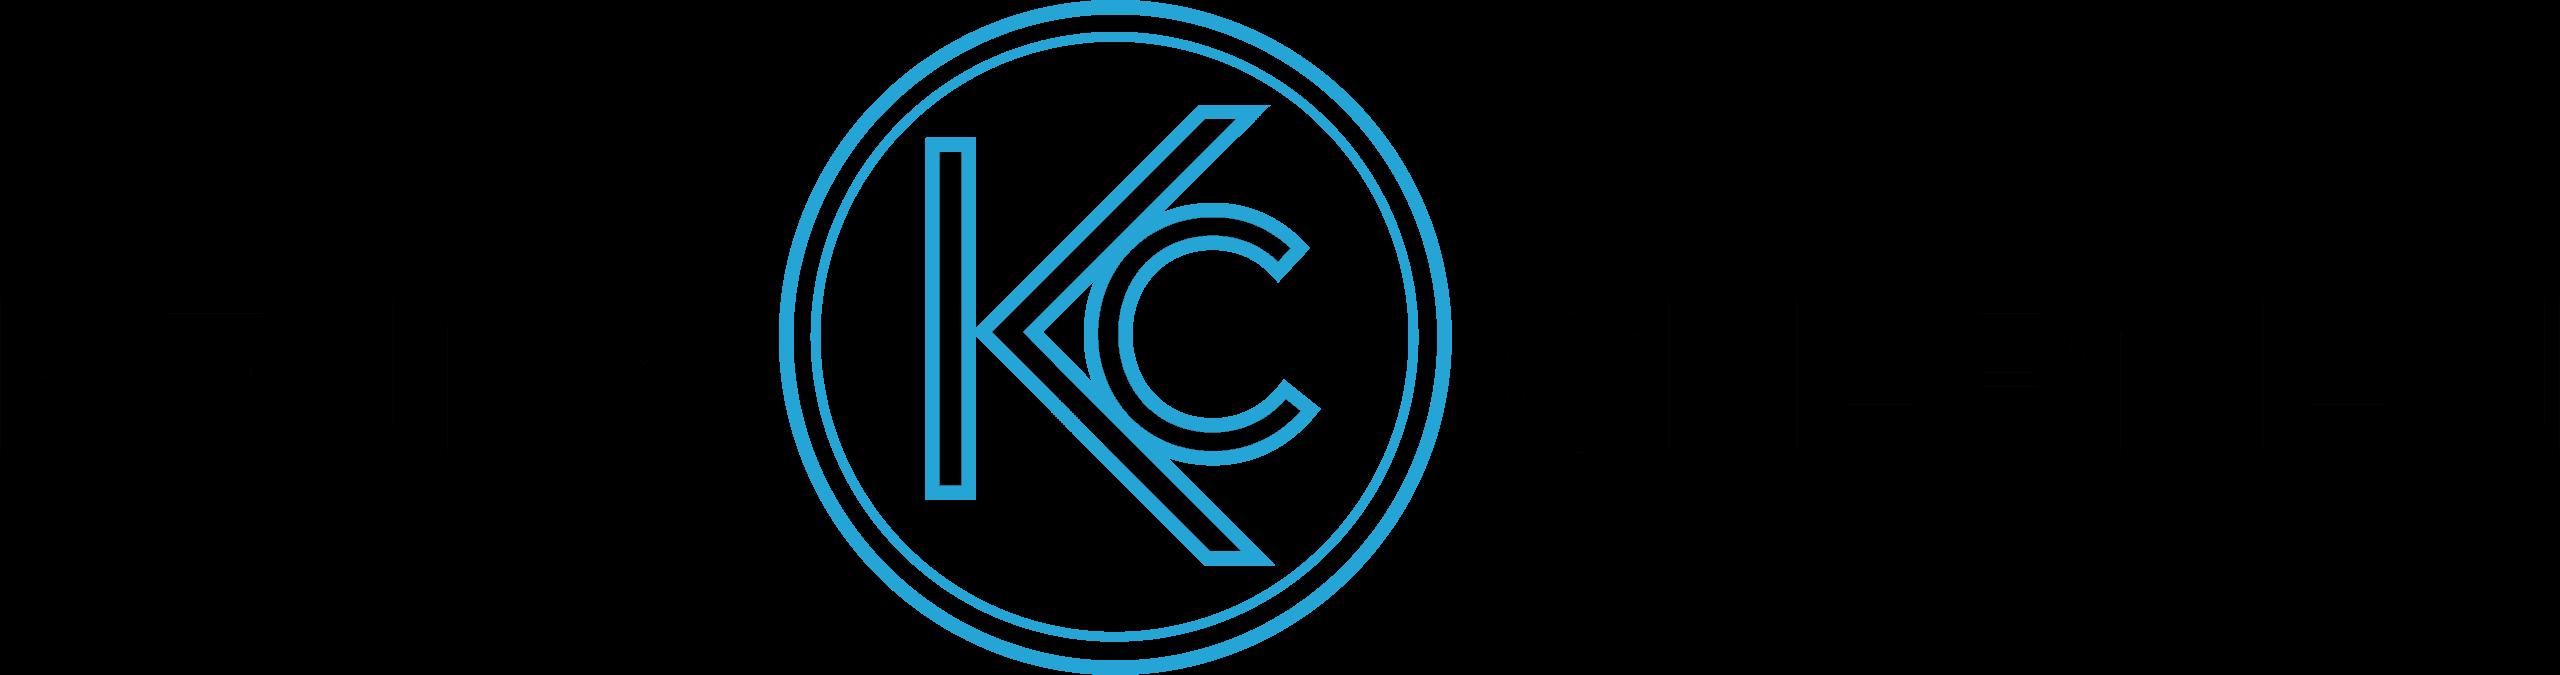 Kenny Chapman